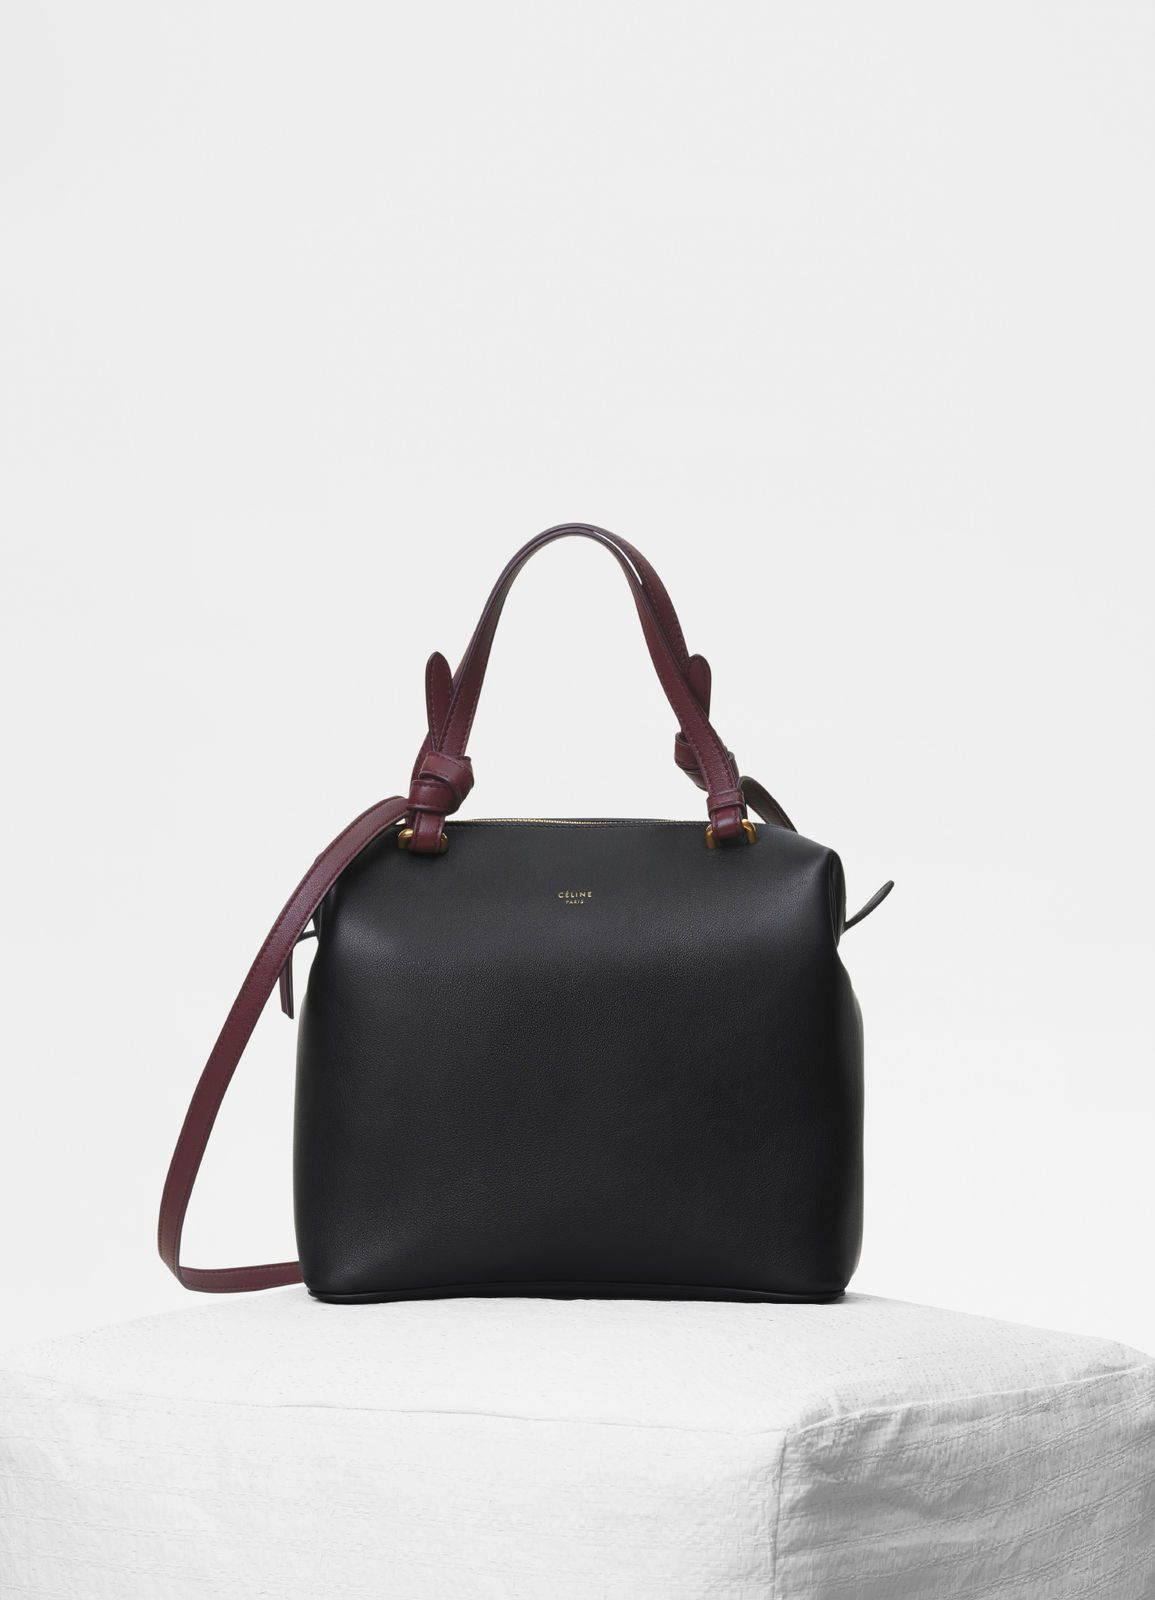 Celine Black Smooth Calfskin Small Soft Cube Bag